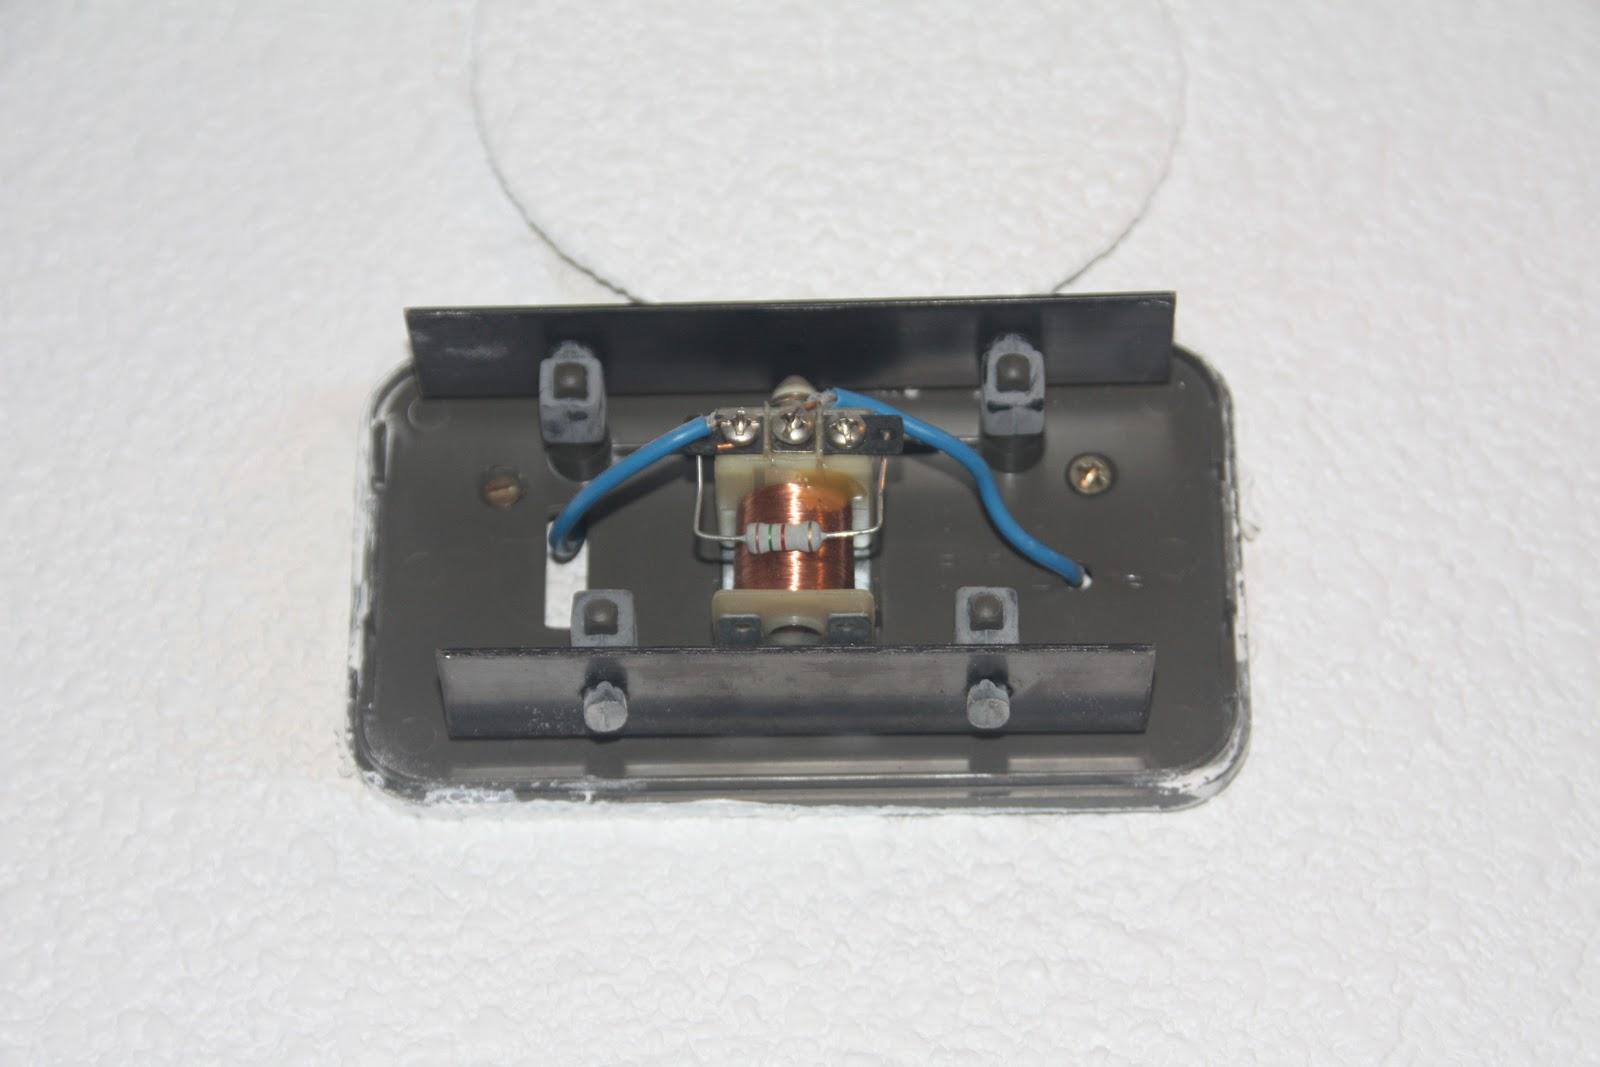 Constr yelo ya instalar interruptor al timbre de la casa - Timbre de casa ...